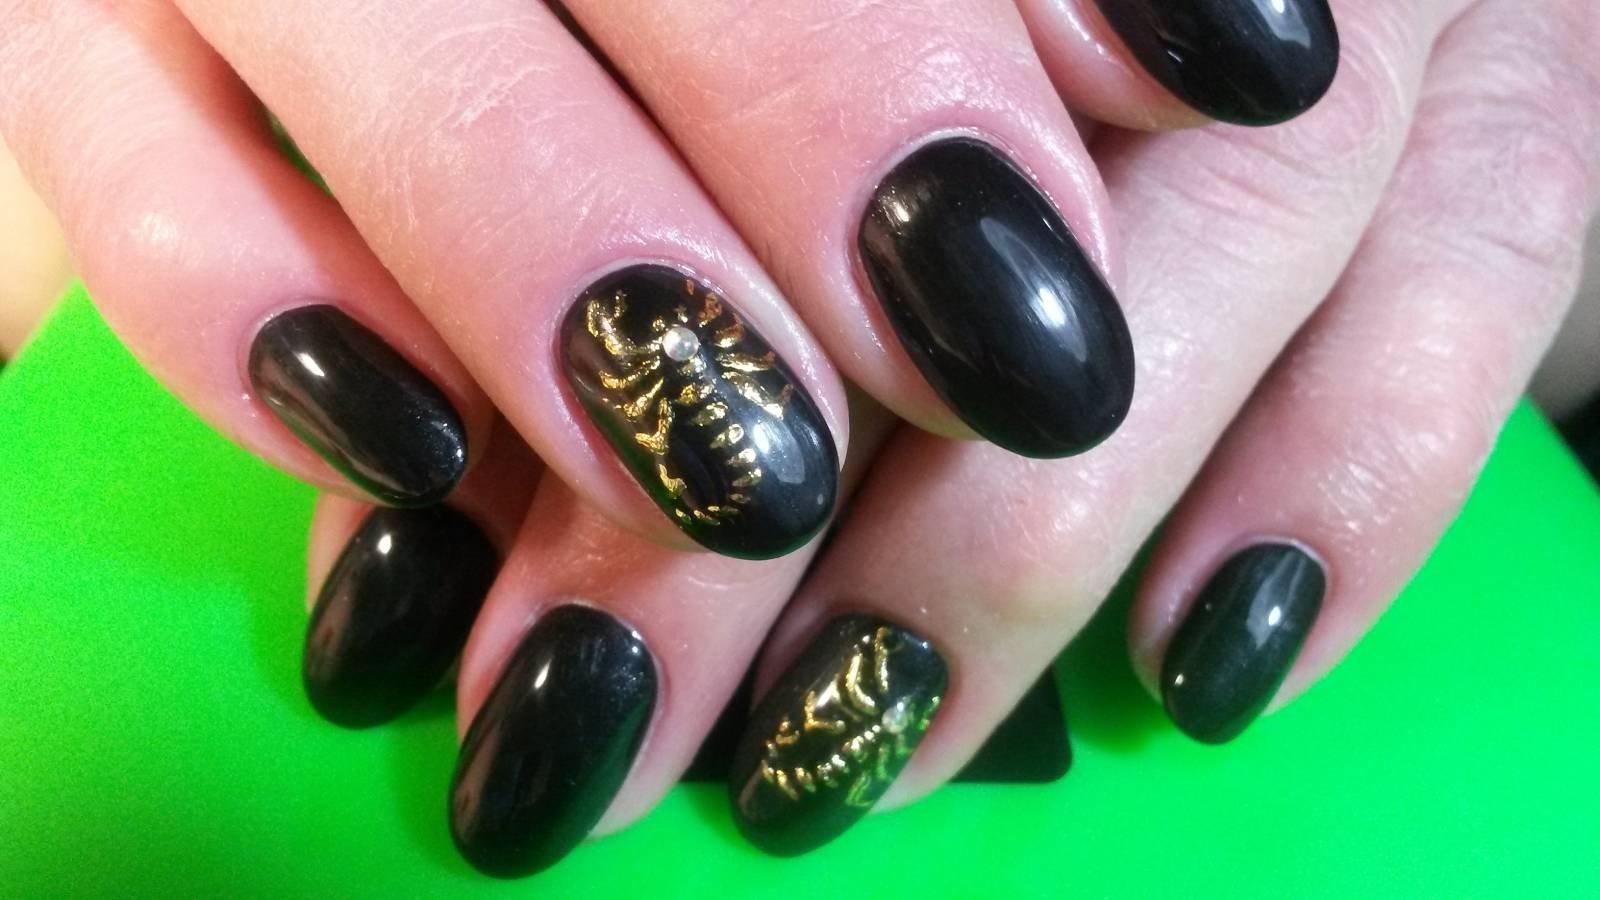 наличники окна нарощенные ногти фото скорпион переходе динамо